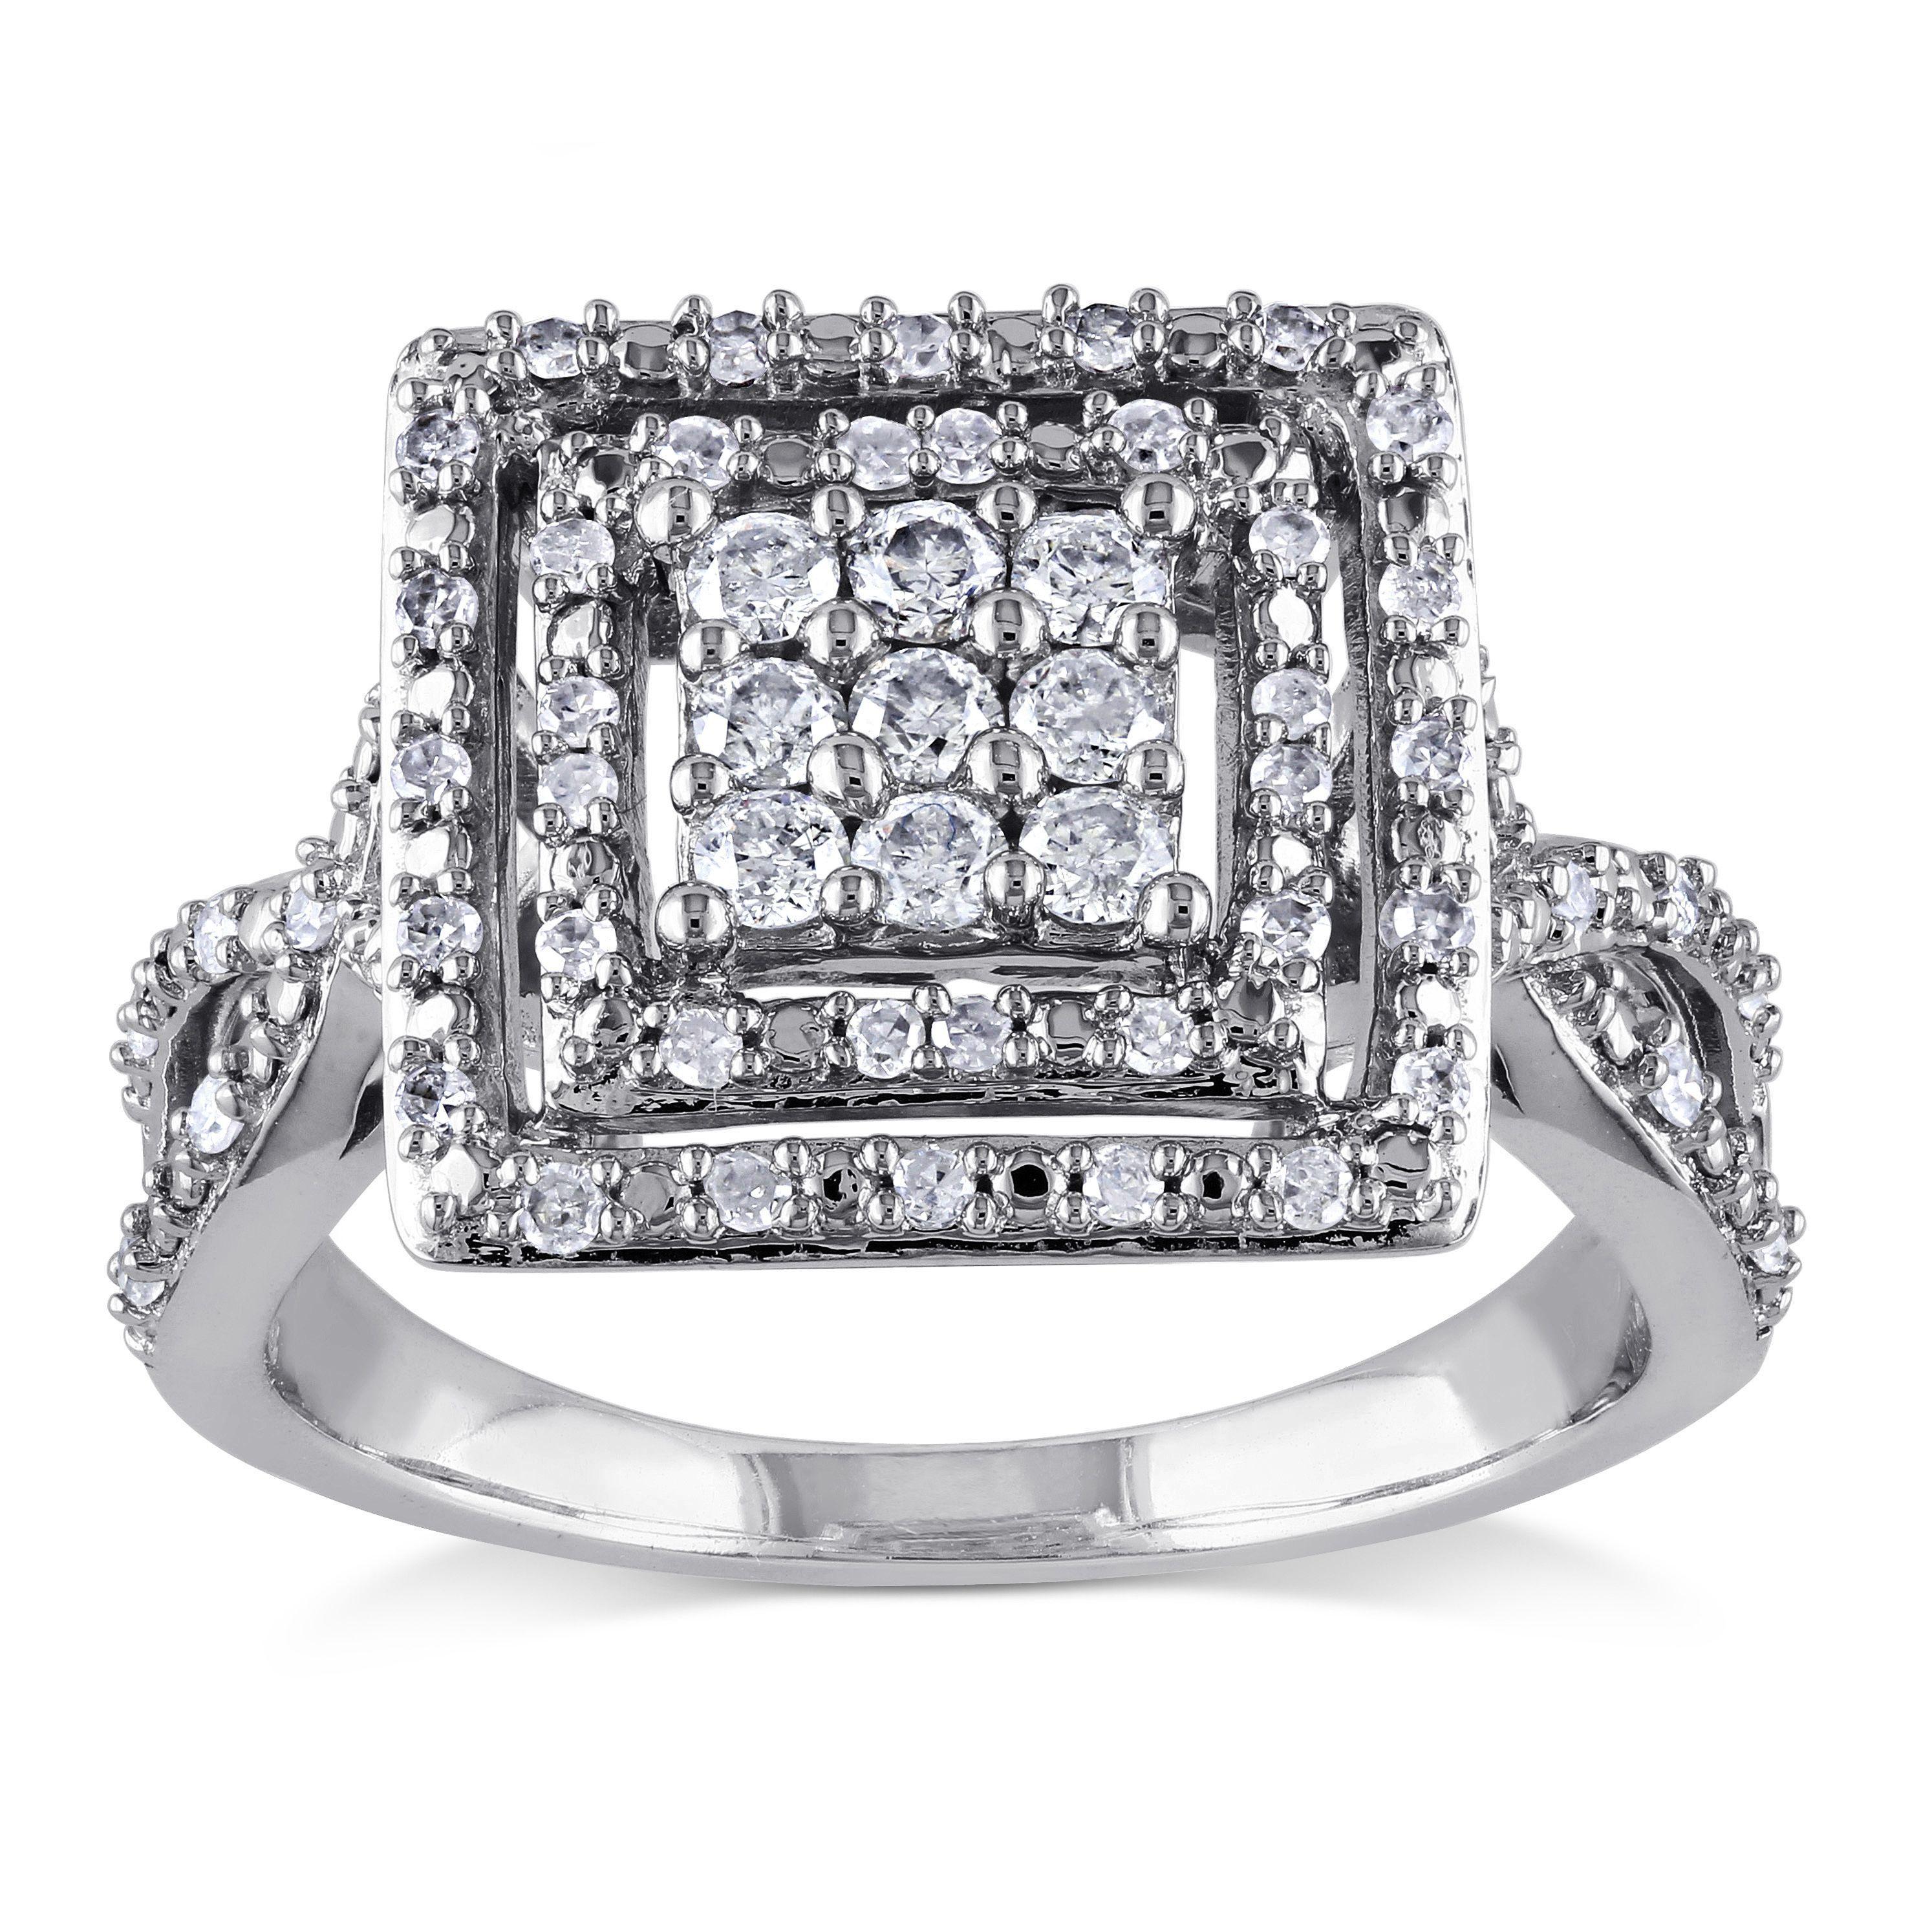 Miadora signature collection 14k white gold 1ct tdw diamond double row - Miadora 10k White Gold 1 2ct Tdw Diamond Double Halo Ring G H I2 I3 Size 10 Women S